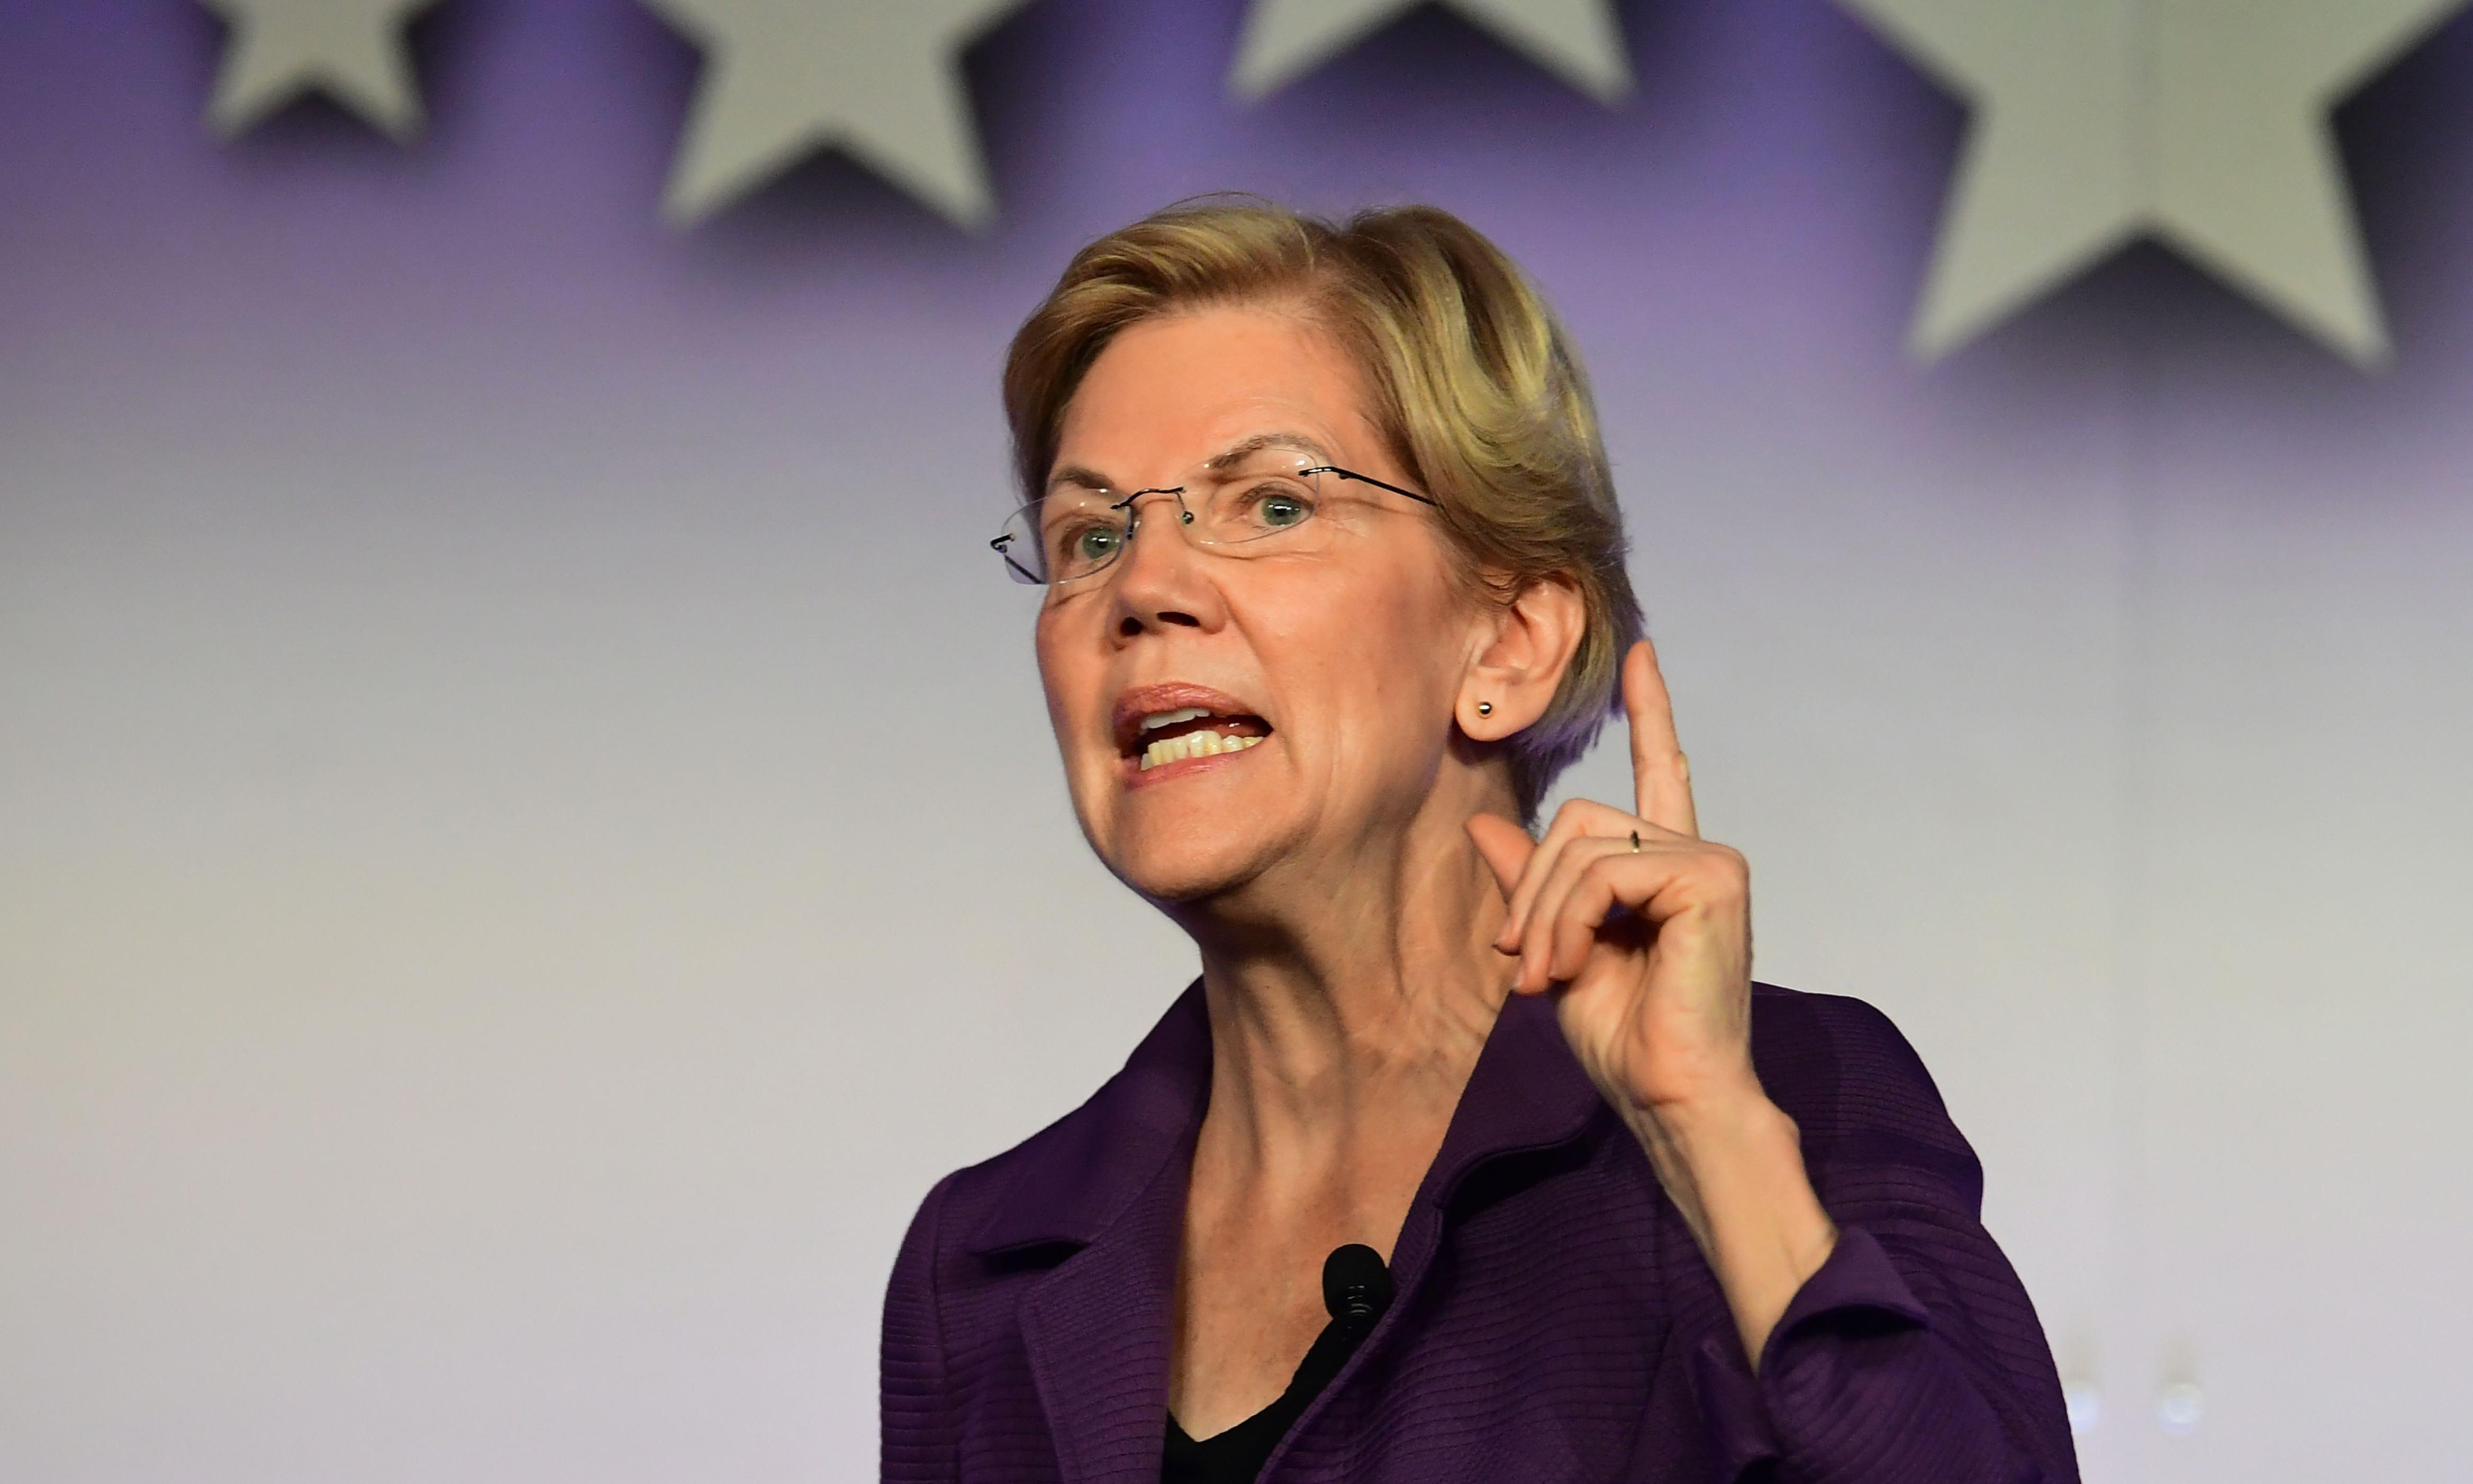 'Too much power': it's Warren v Facebook in a key 2020 battle